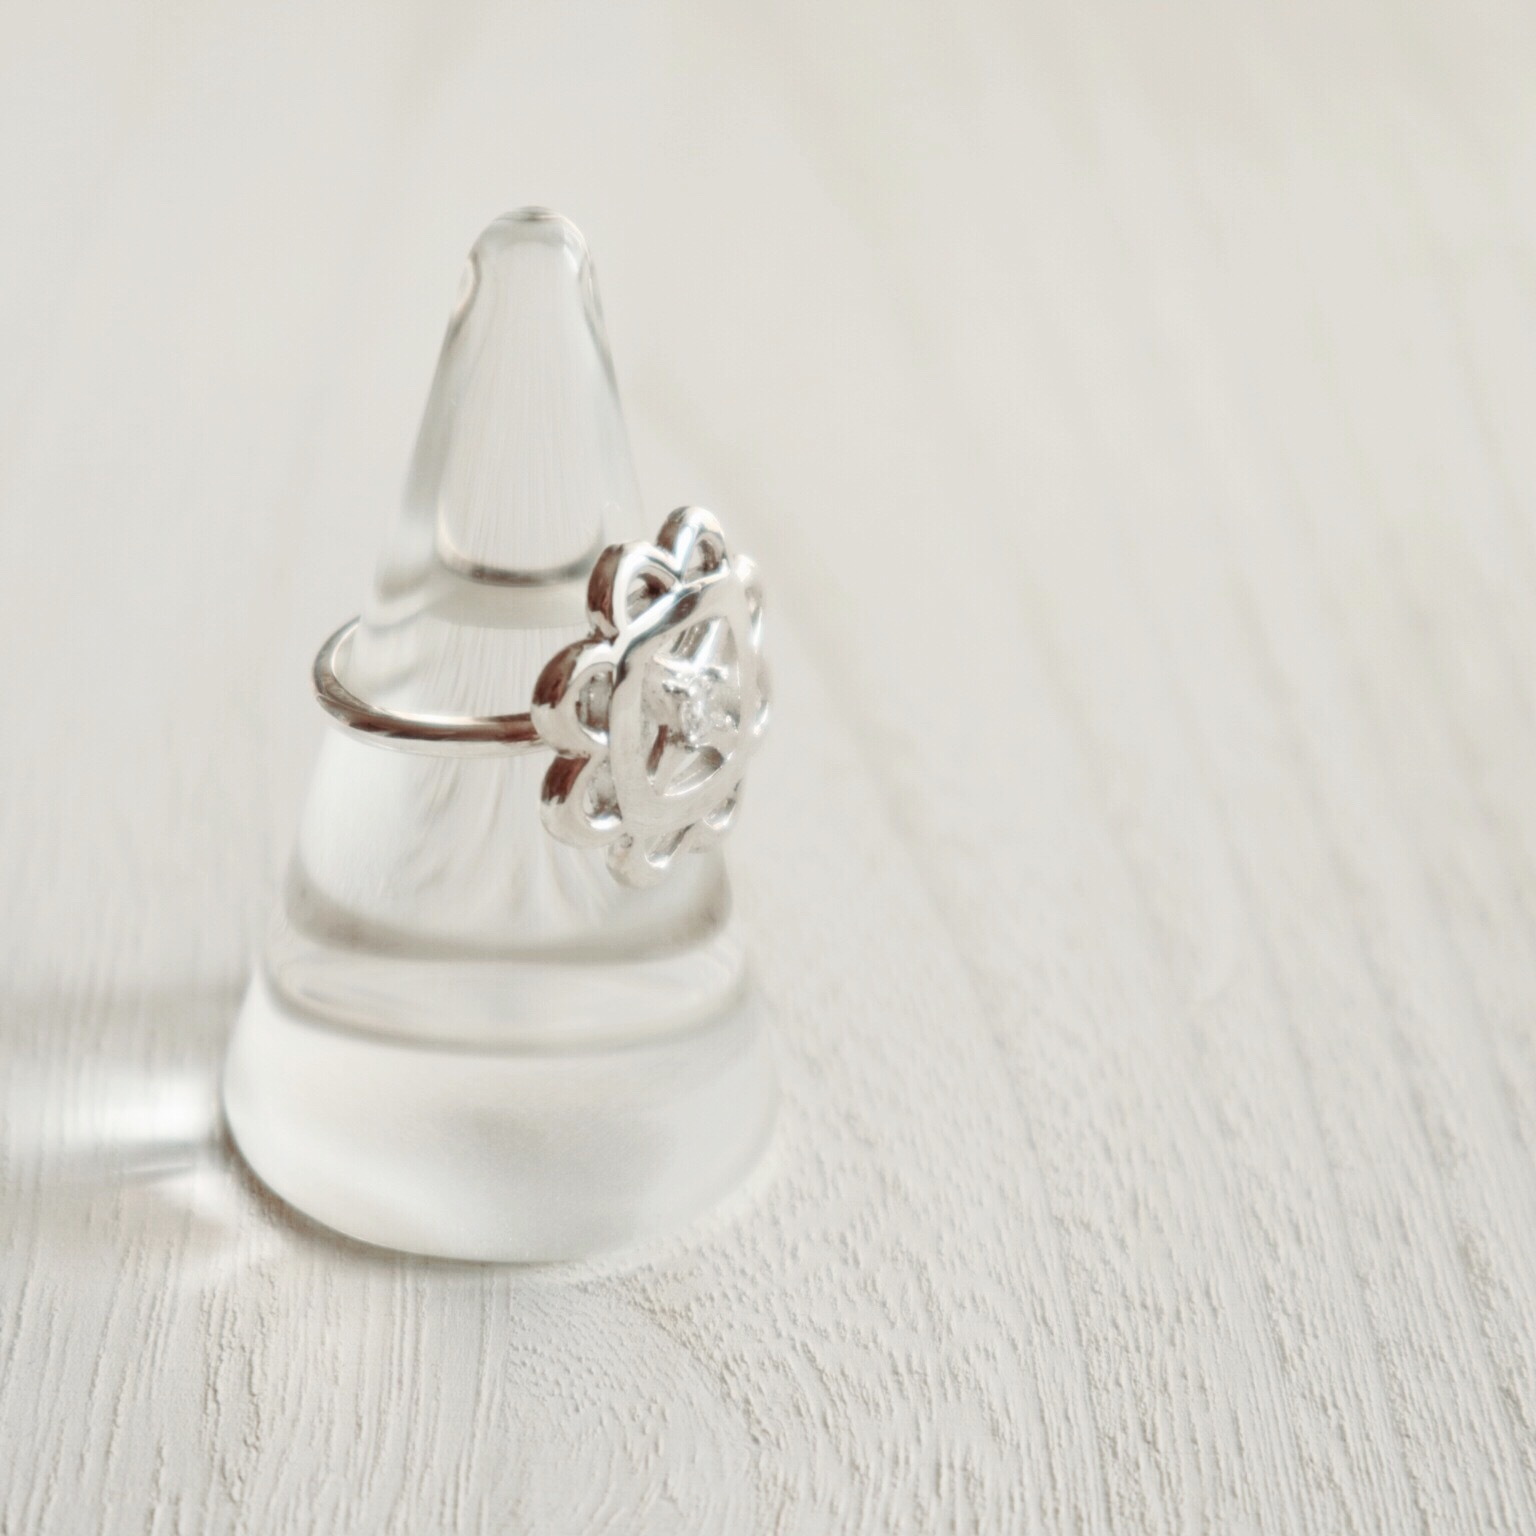 Clover Ring (R18-01)